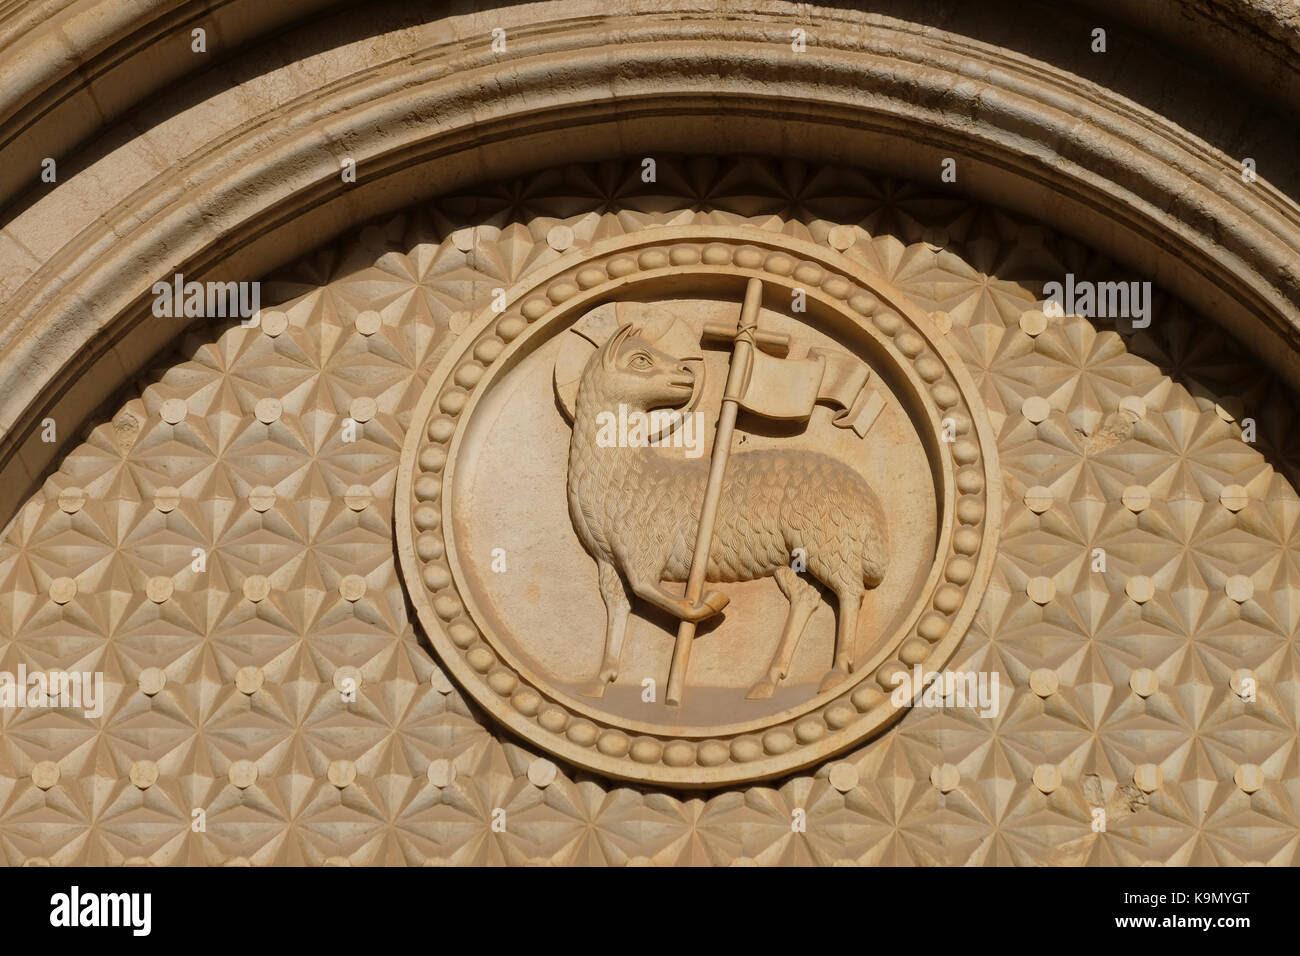 Agnus Dei The Christian Symbol Of The Lamb Of God Above The Main